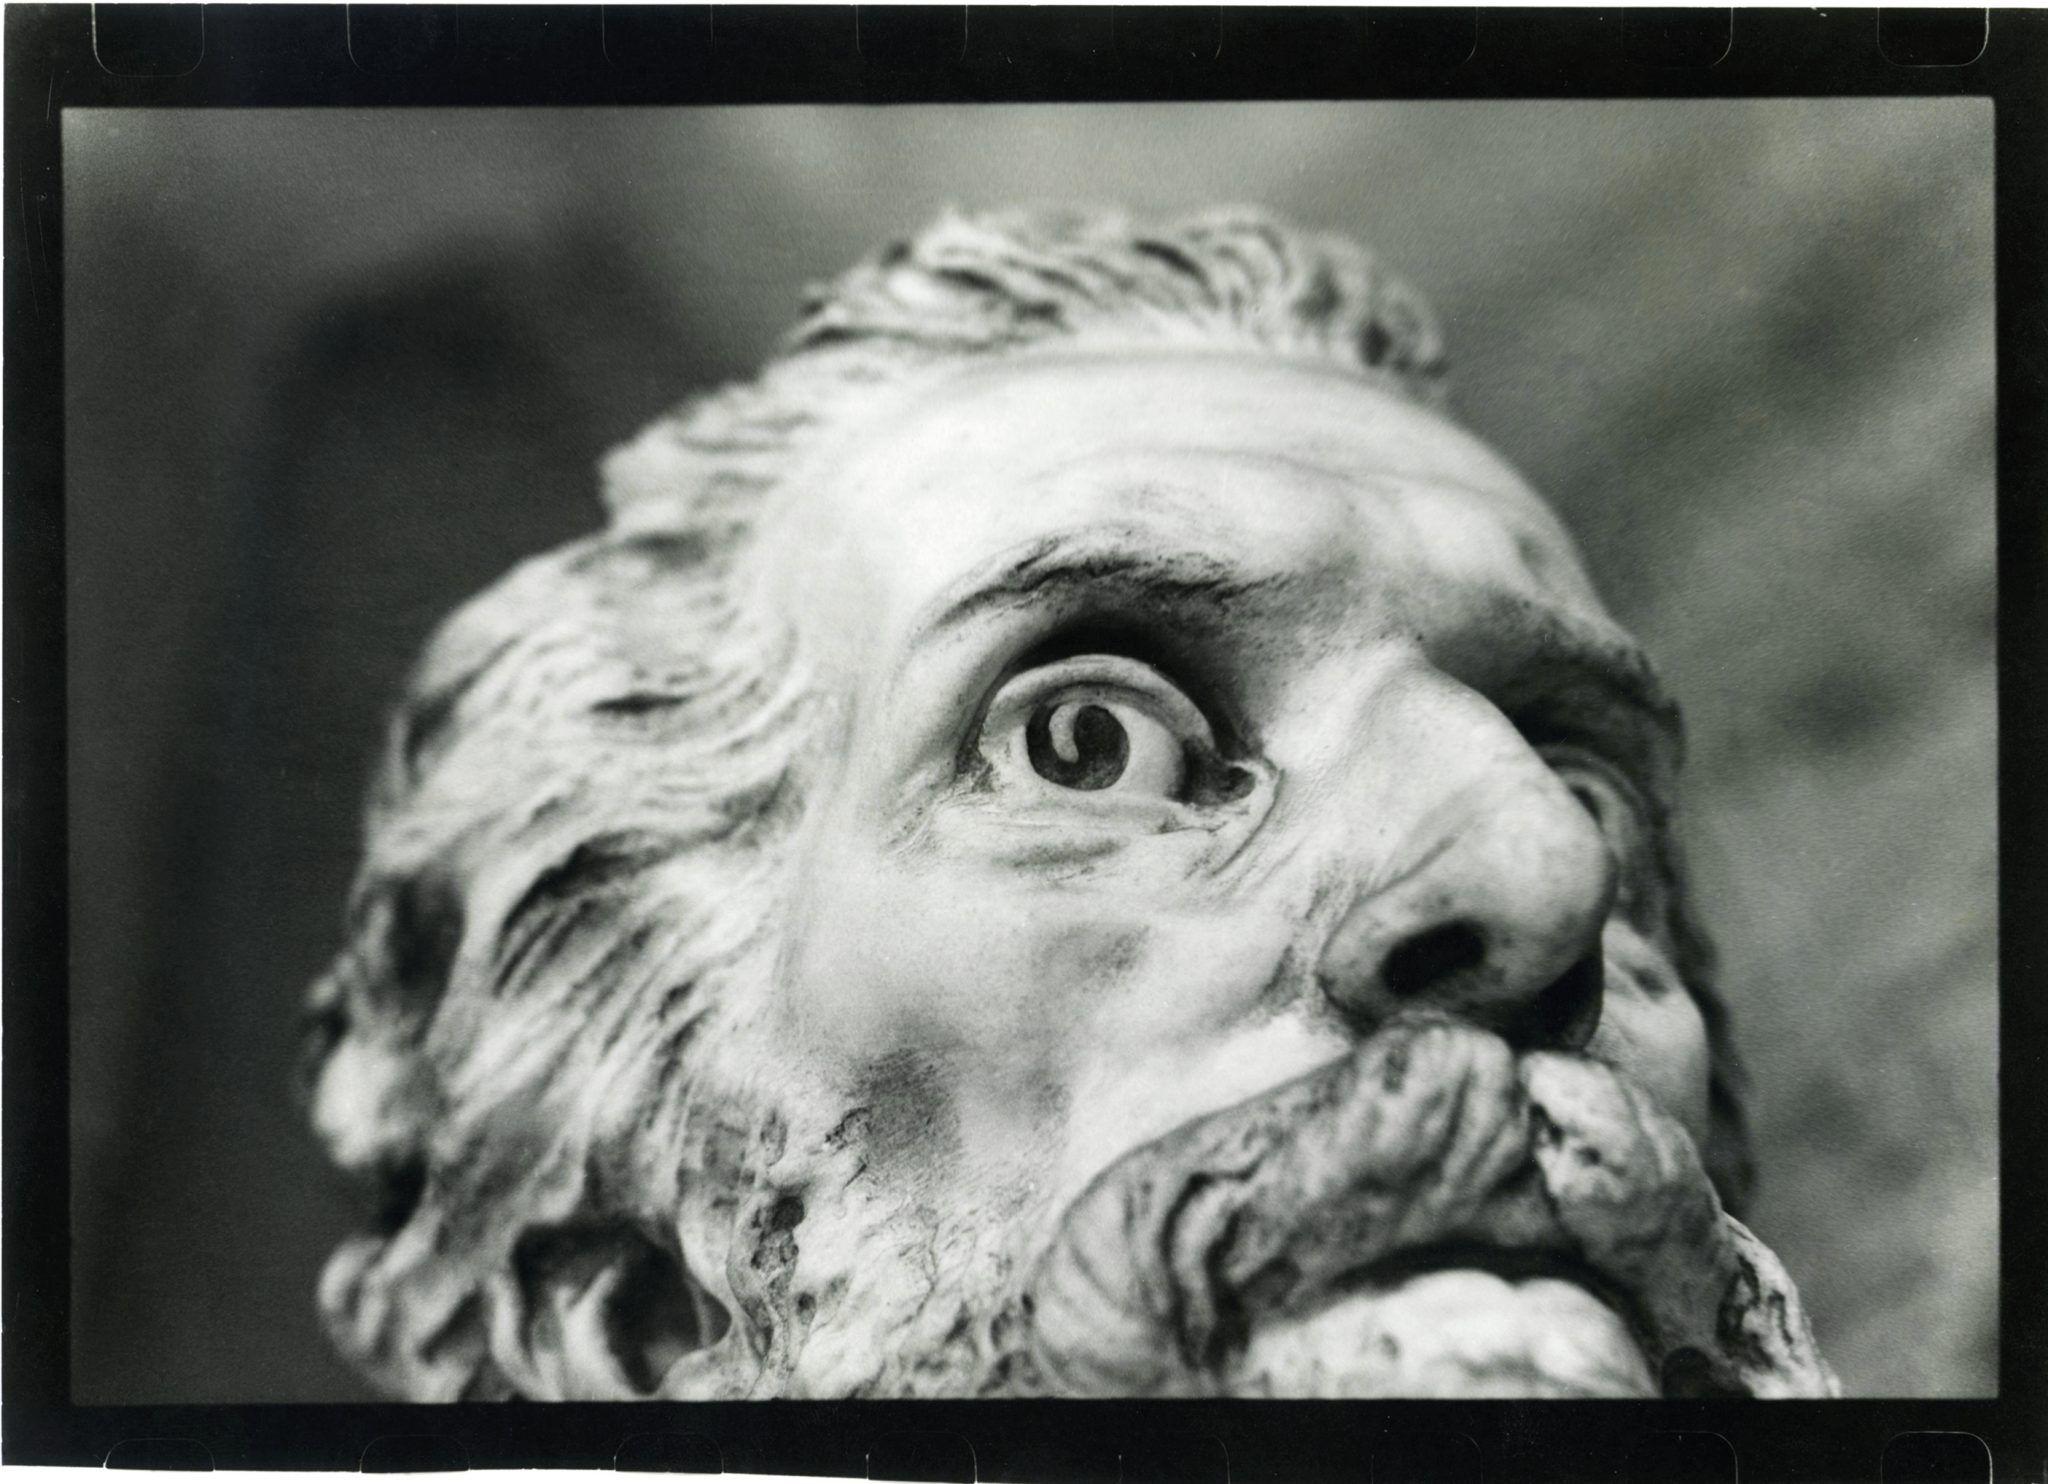 Portrait n.7 (2002), Paolo Novelli